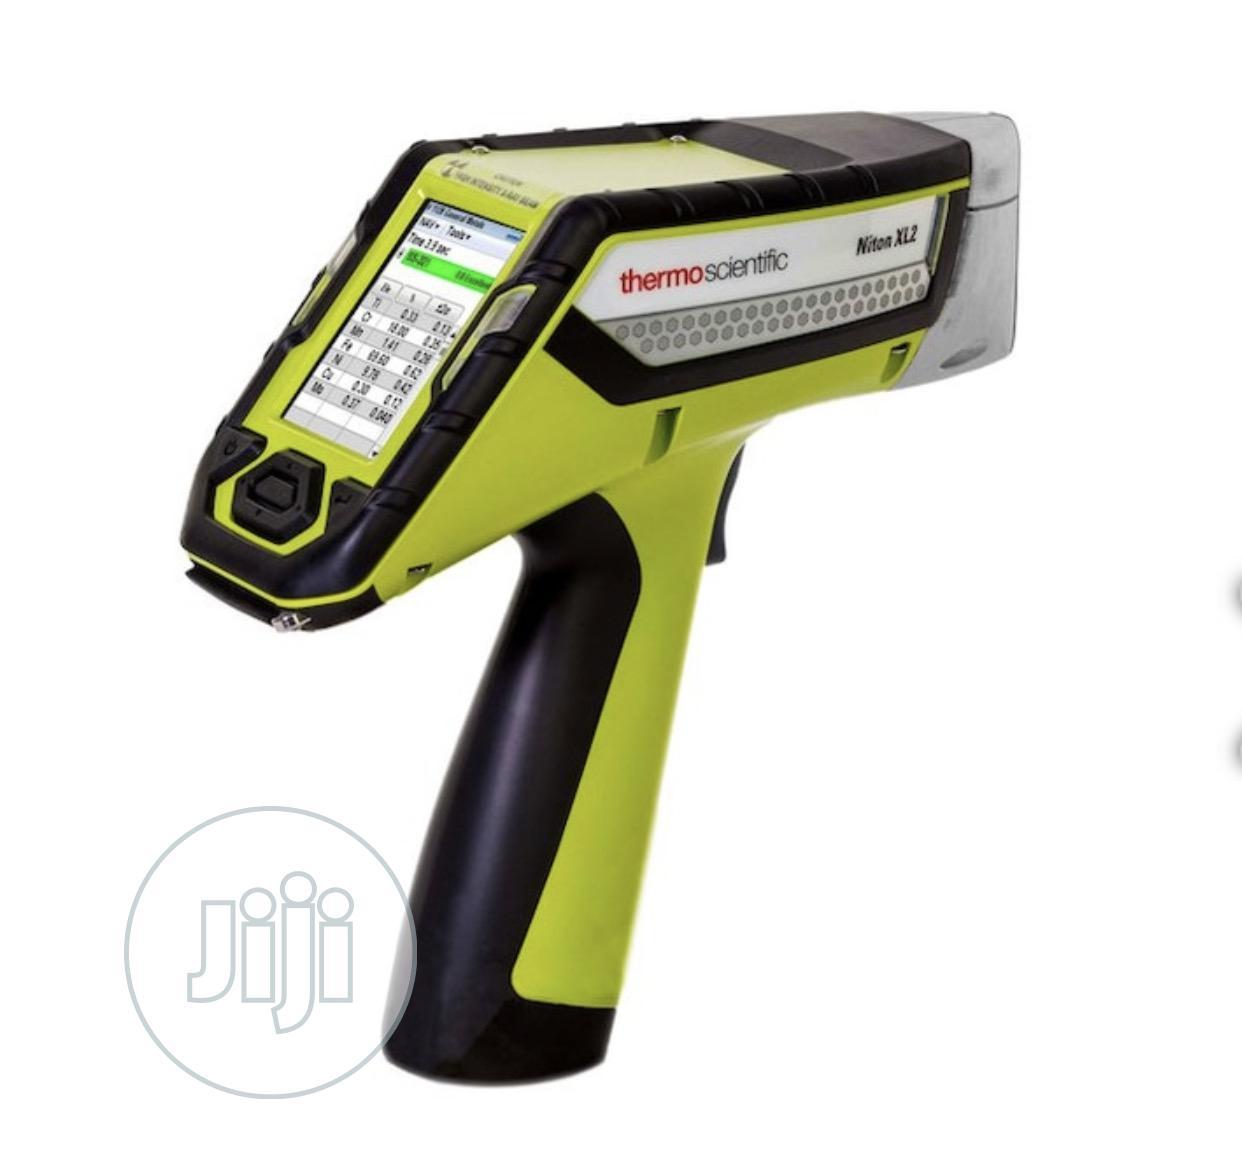 Nitontm XL2 Plus Handheld XRF Gold / Precious Metal Analyzer | Measuring & Layout Tools for sale in Ojo, Lagos State, Nigeria